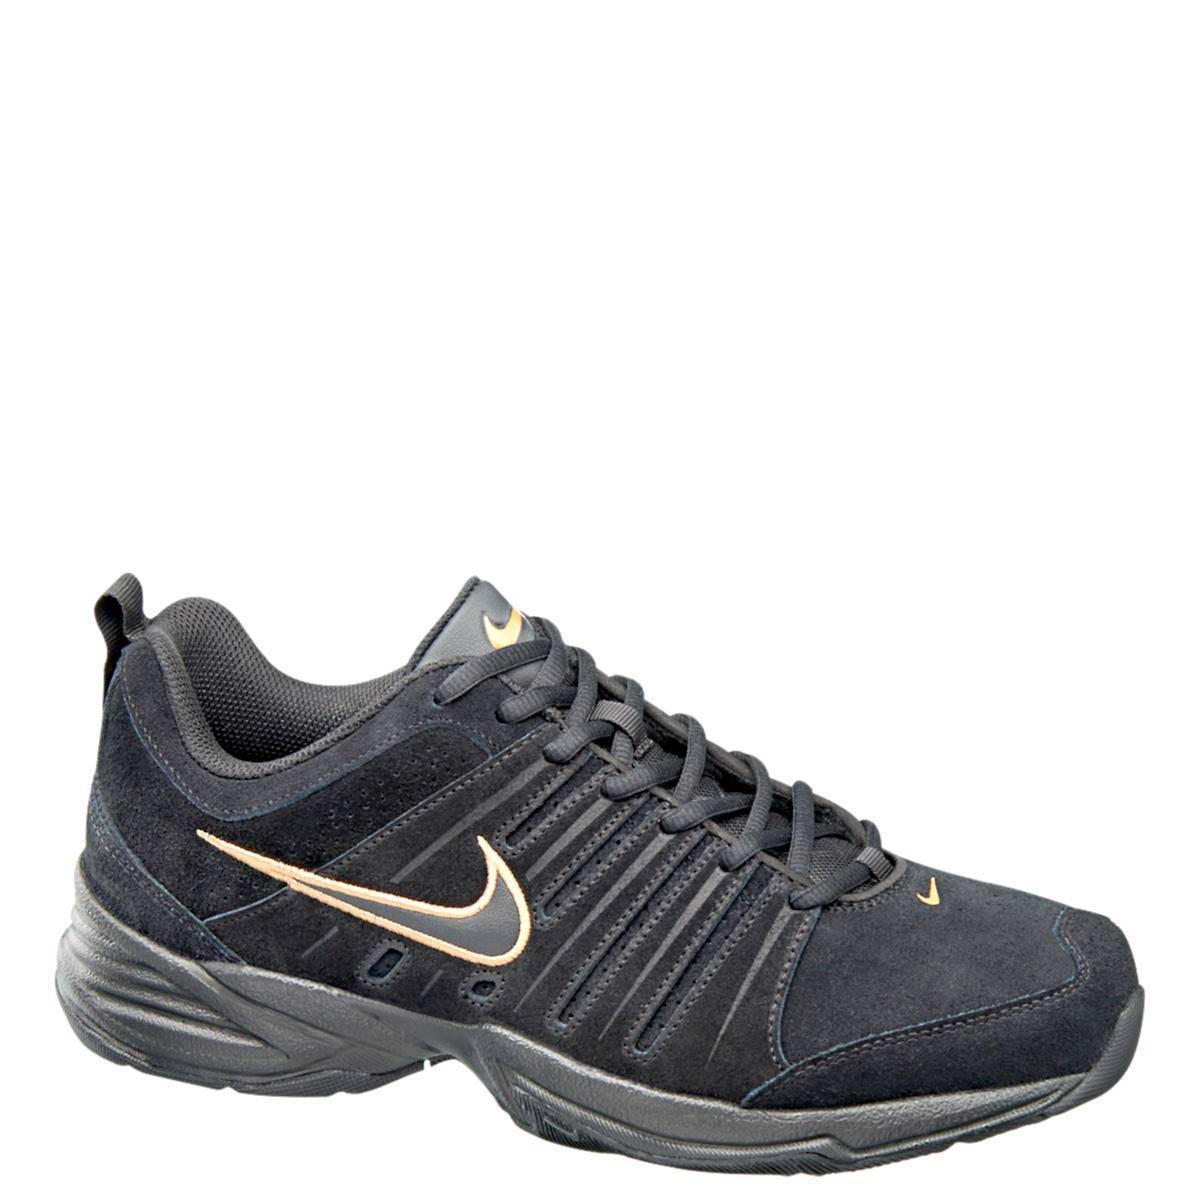 Wehkamp Sportschoenen Q1qx6twrz Nike Leren Heren q8zAwE6Tx